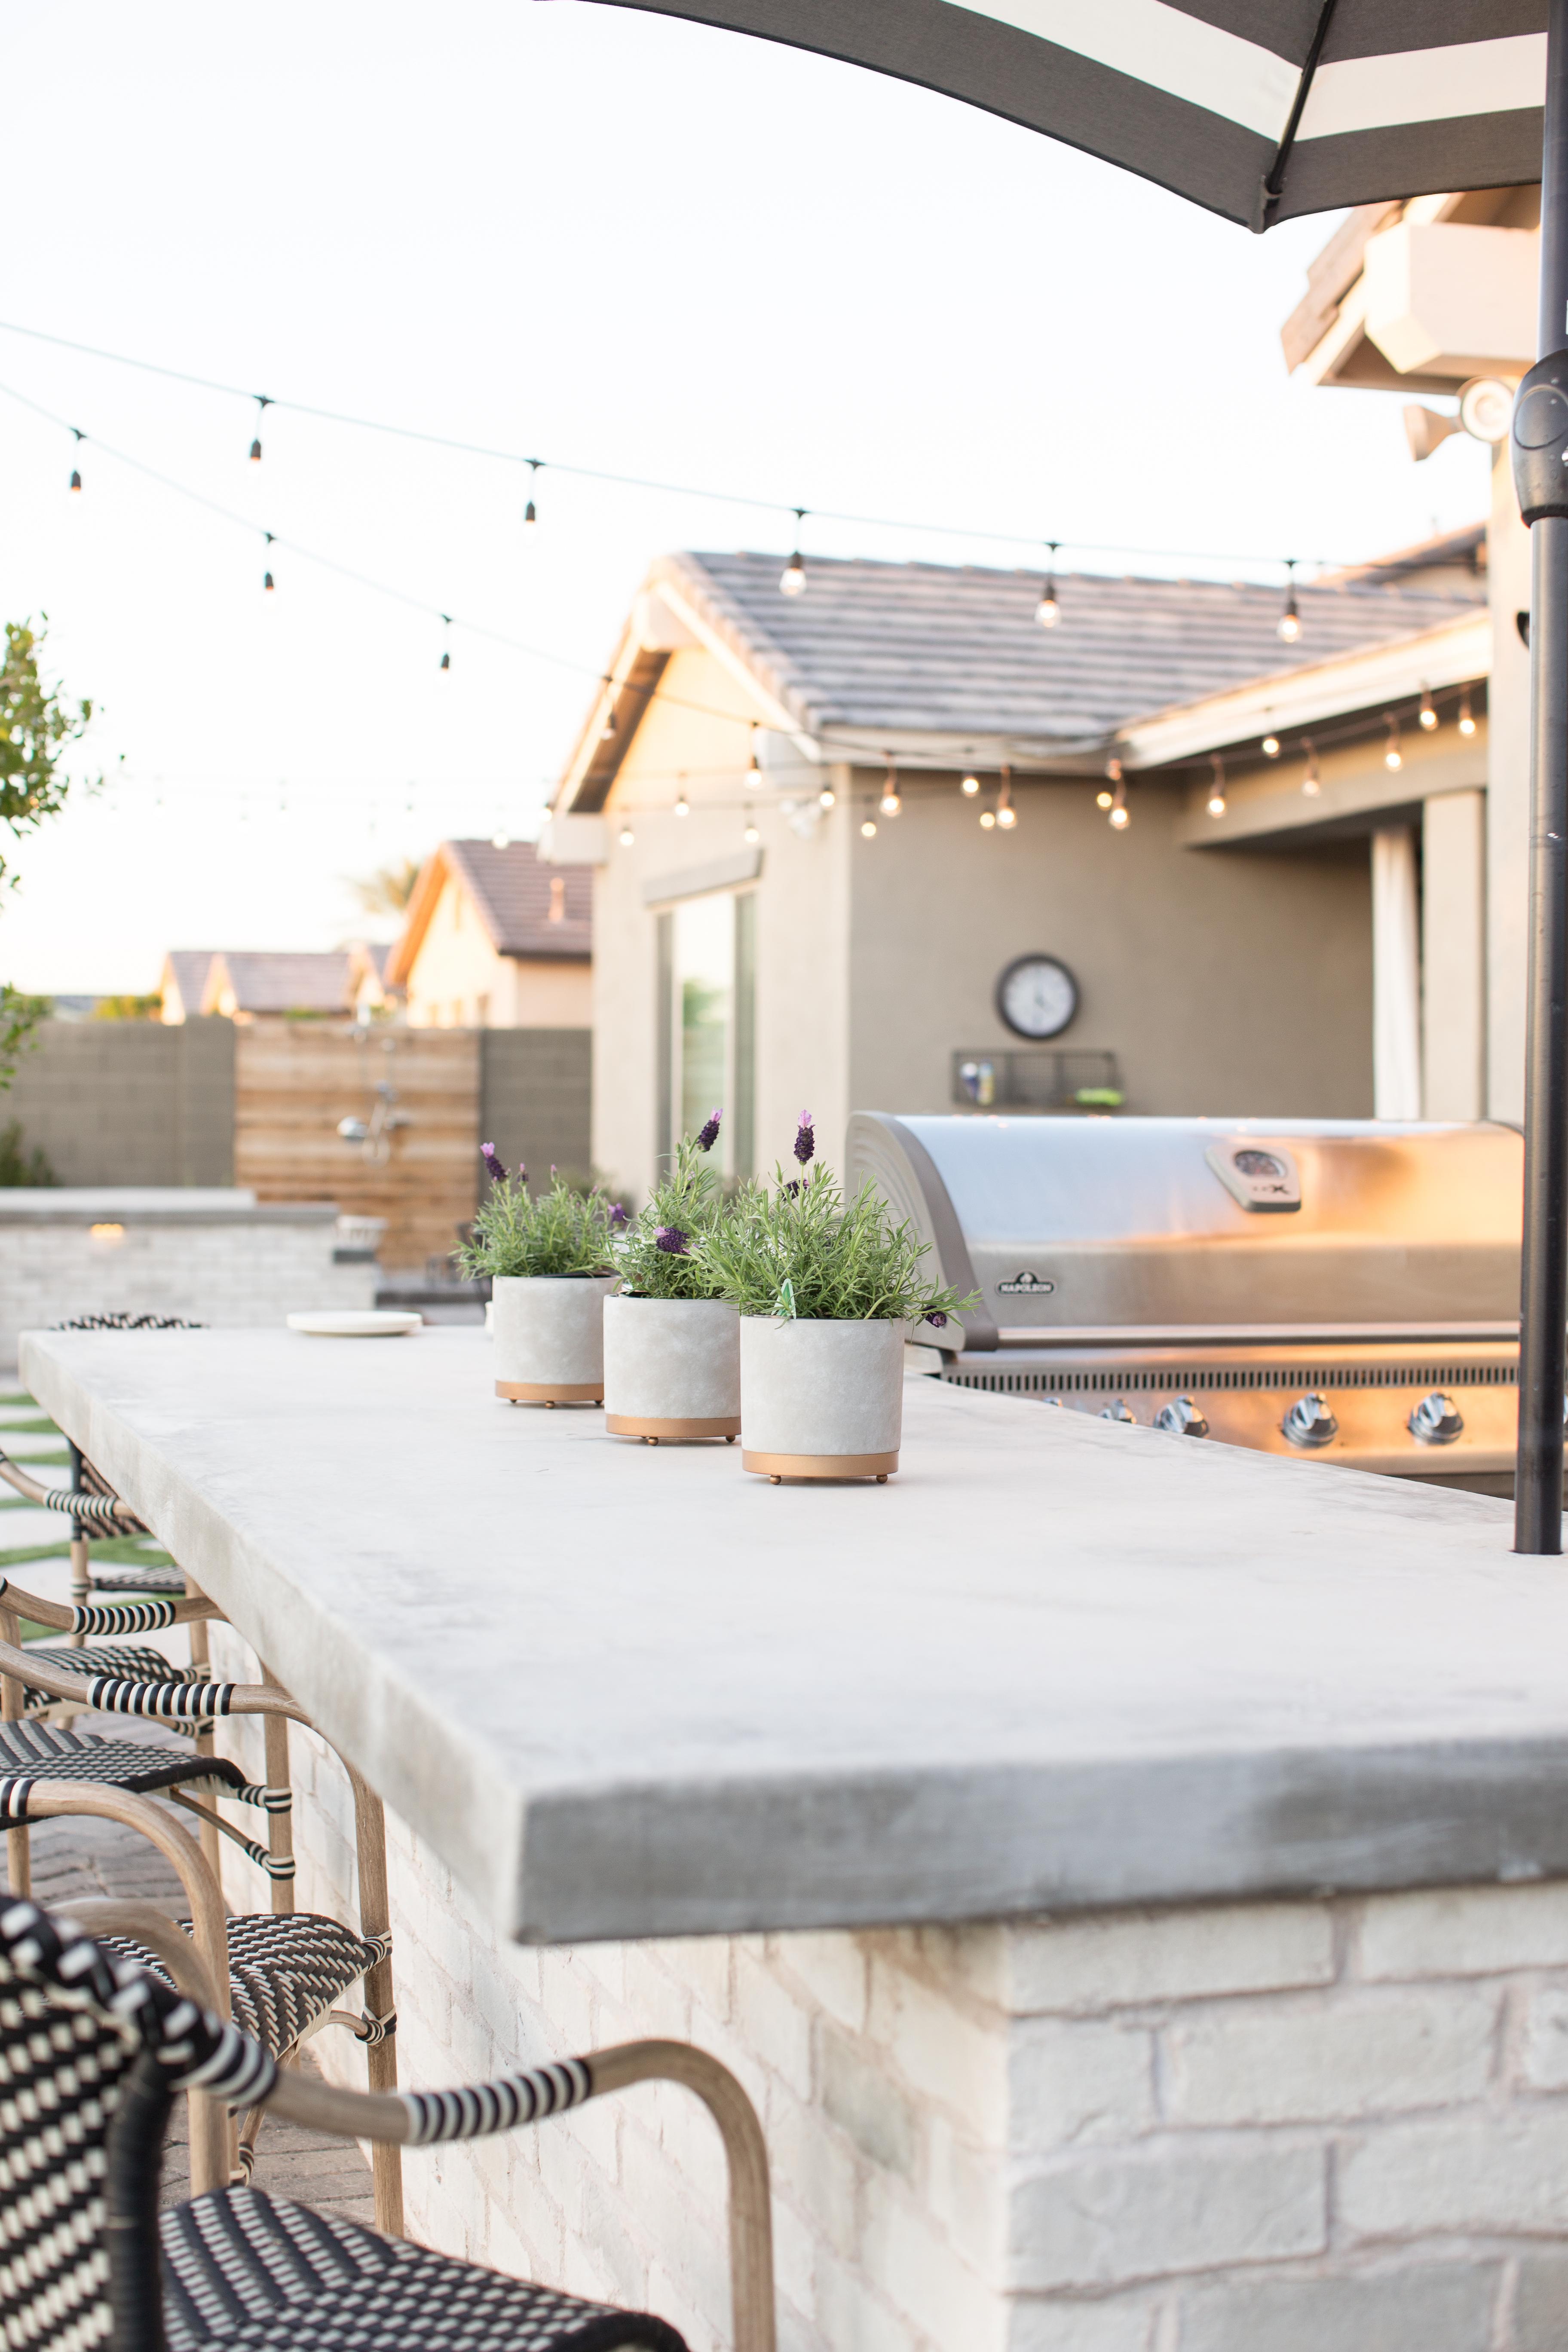 Outdoor Kitchen Countertop Concrete